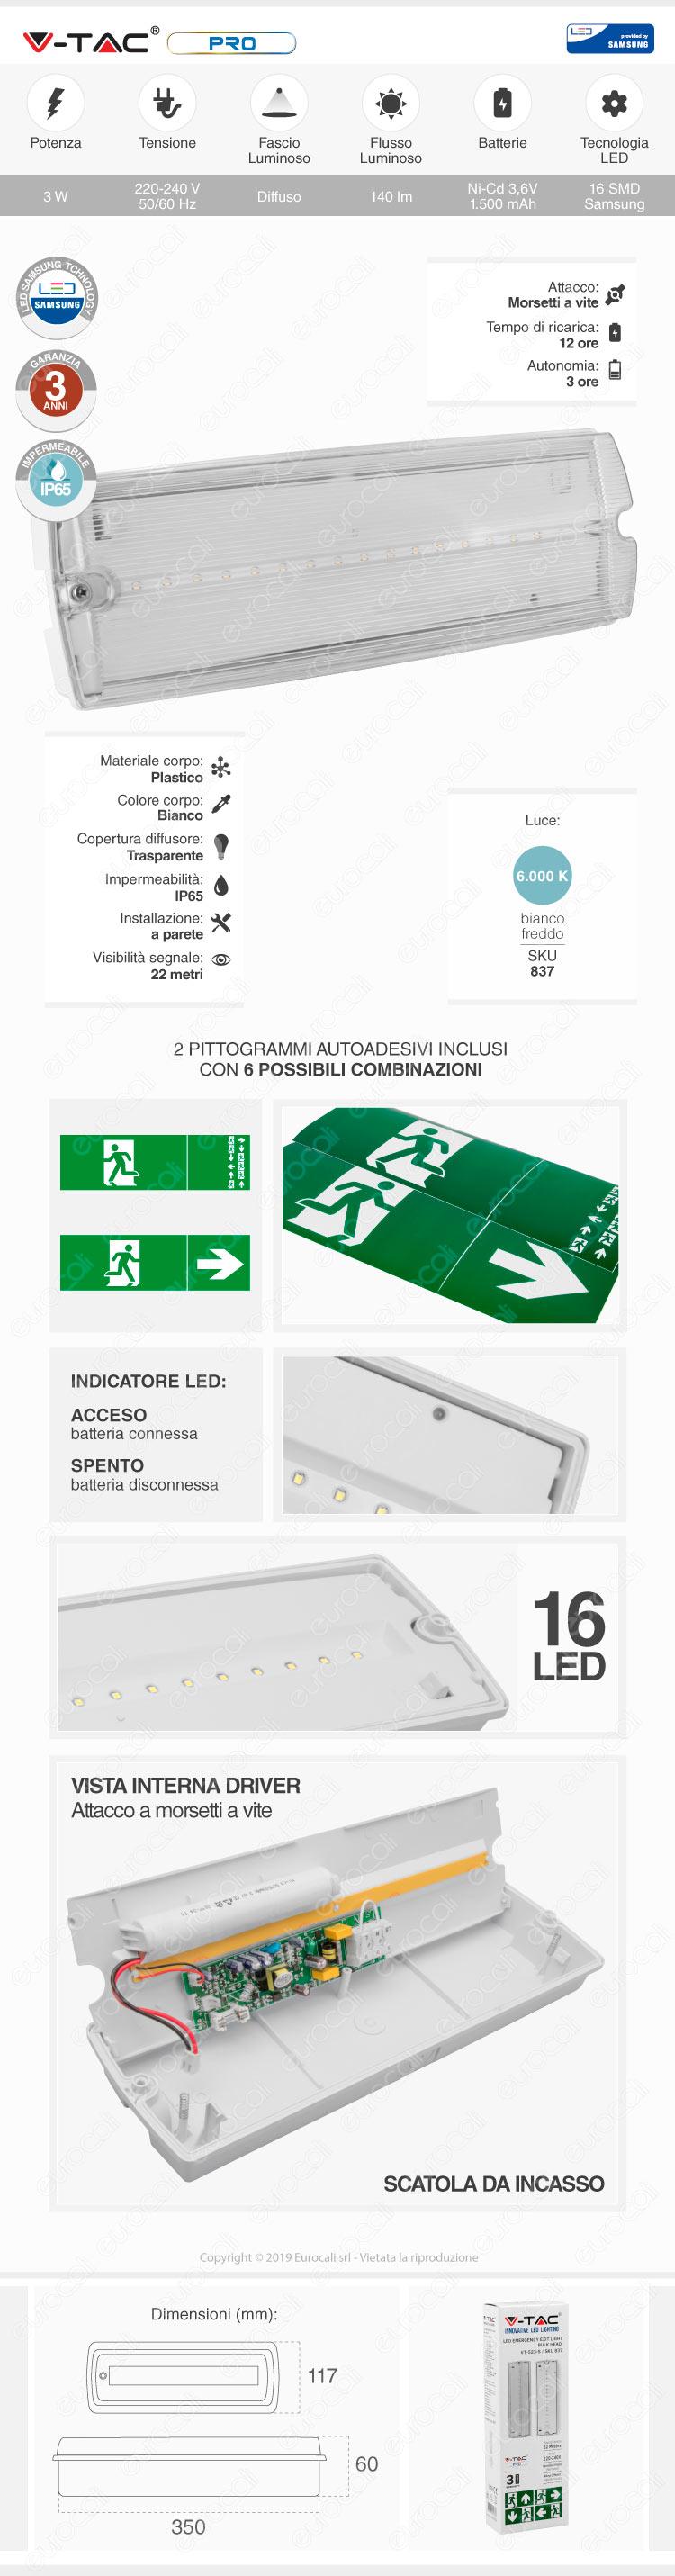 V-Tac PRO VT-523-S Lampada LED d'Emergenza Anti Black Out Grado Protezione IP65